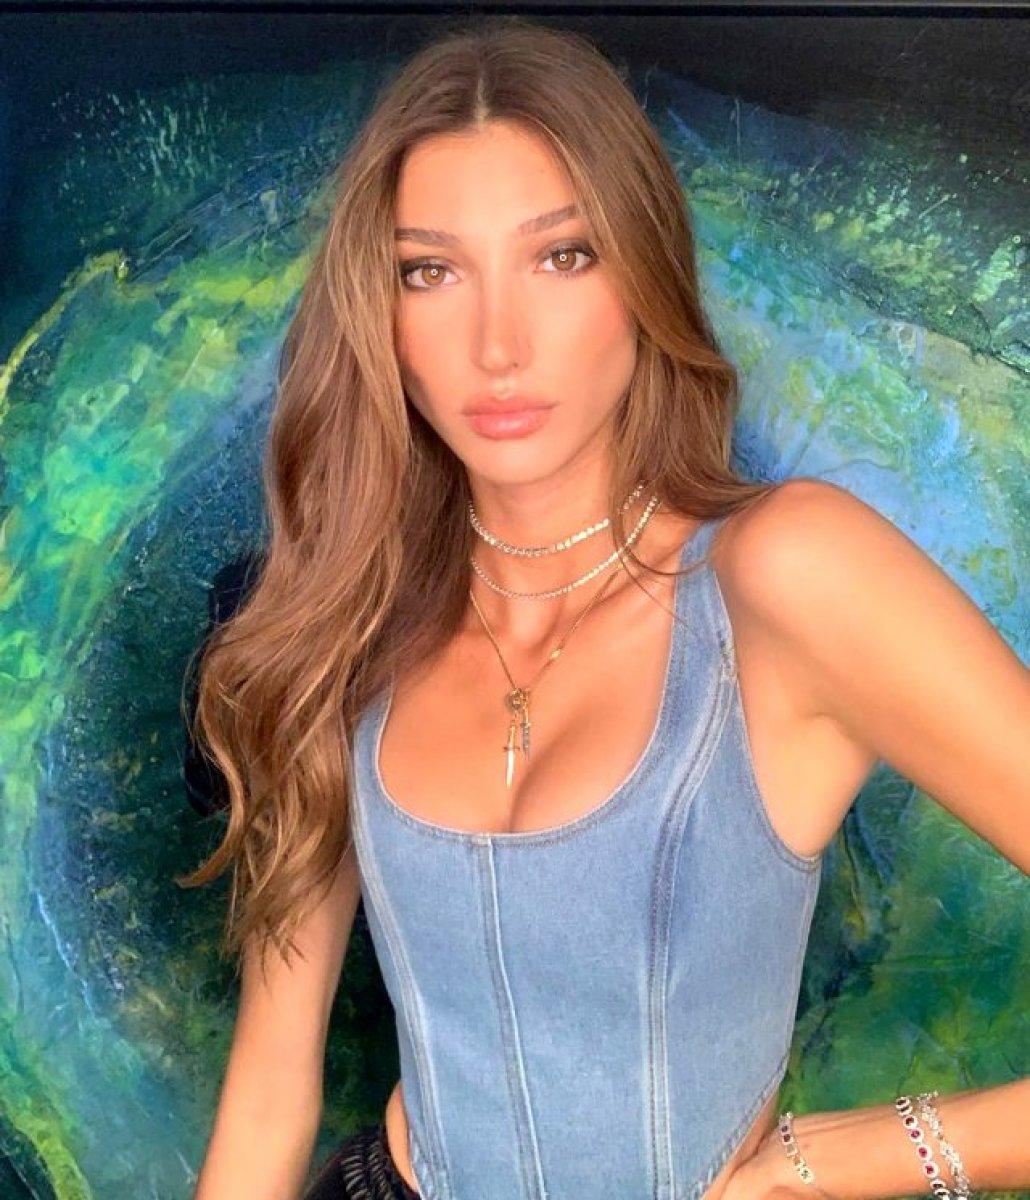 Miss Turkey Kimdir Bayan Şevval Şahin?  Sevgilisi Yiğit Marcus Aral kimdir?  # 4